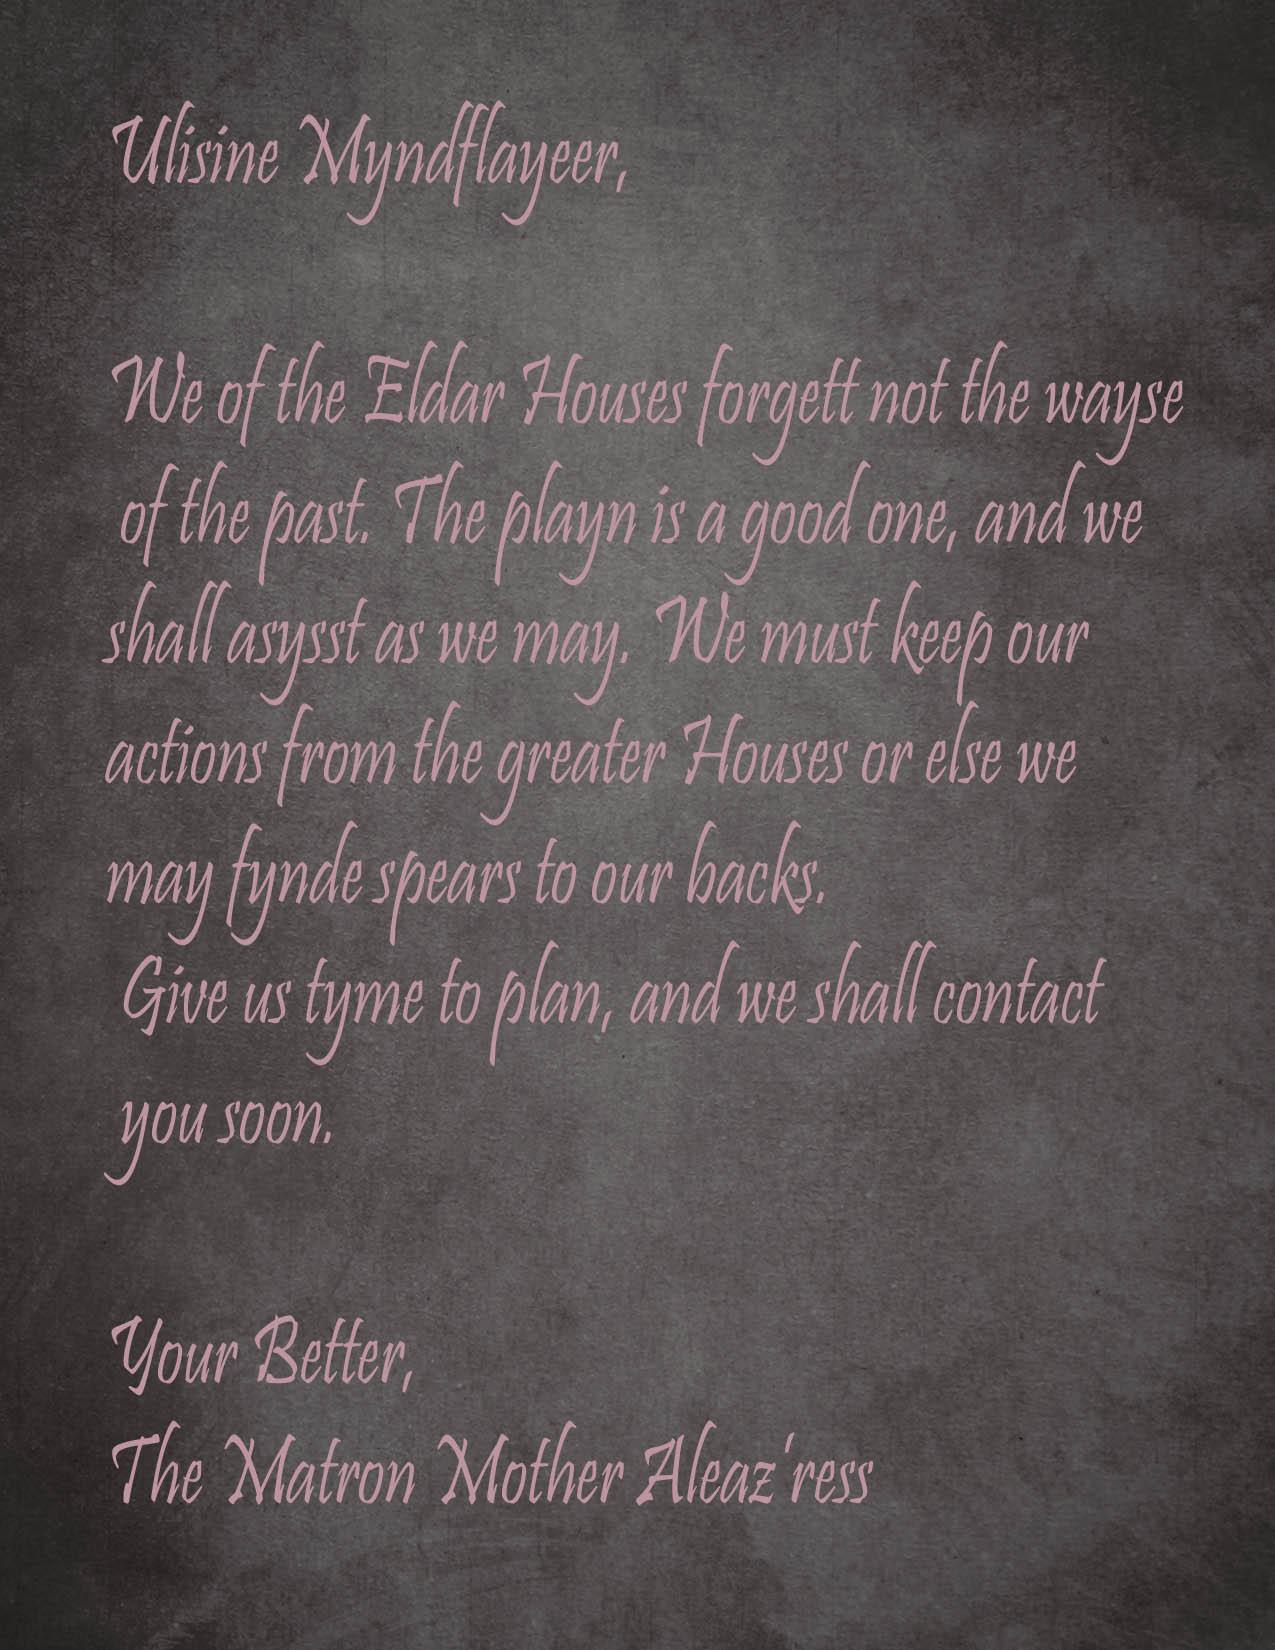 Matron mother letter